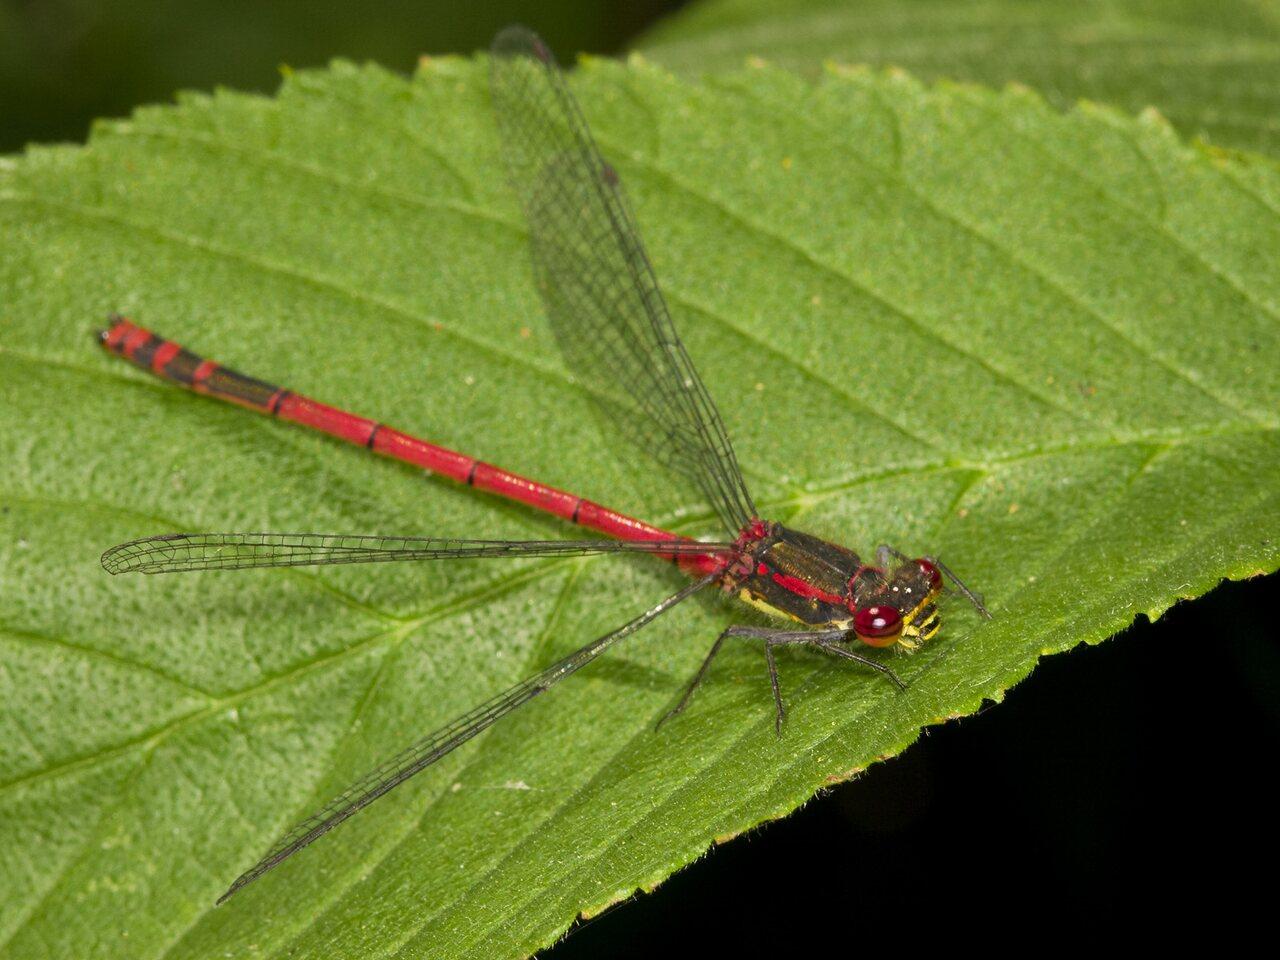 Pyrrhosoma-nymphula-3635.jpg